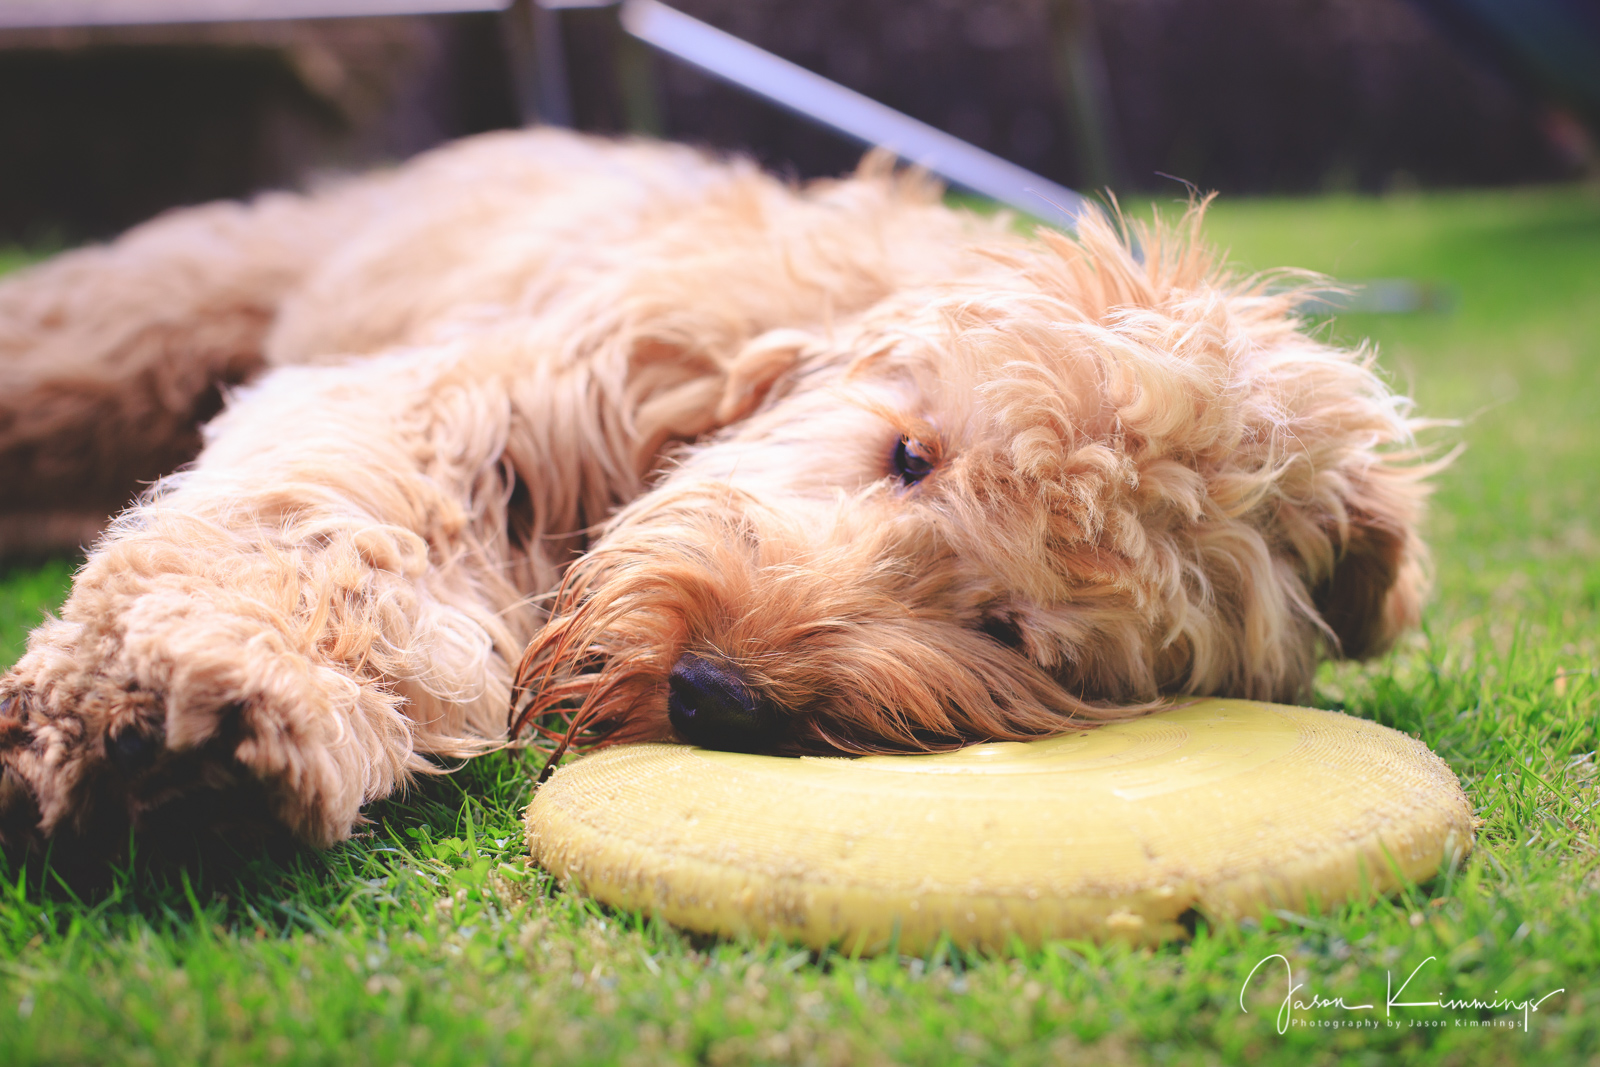 Dog-pet-photography-edinburgh-glasgow-west-lothian-11.jpg